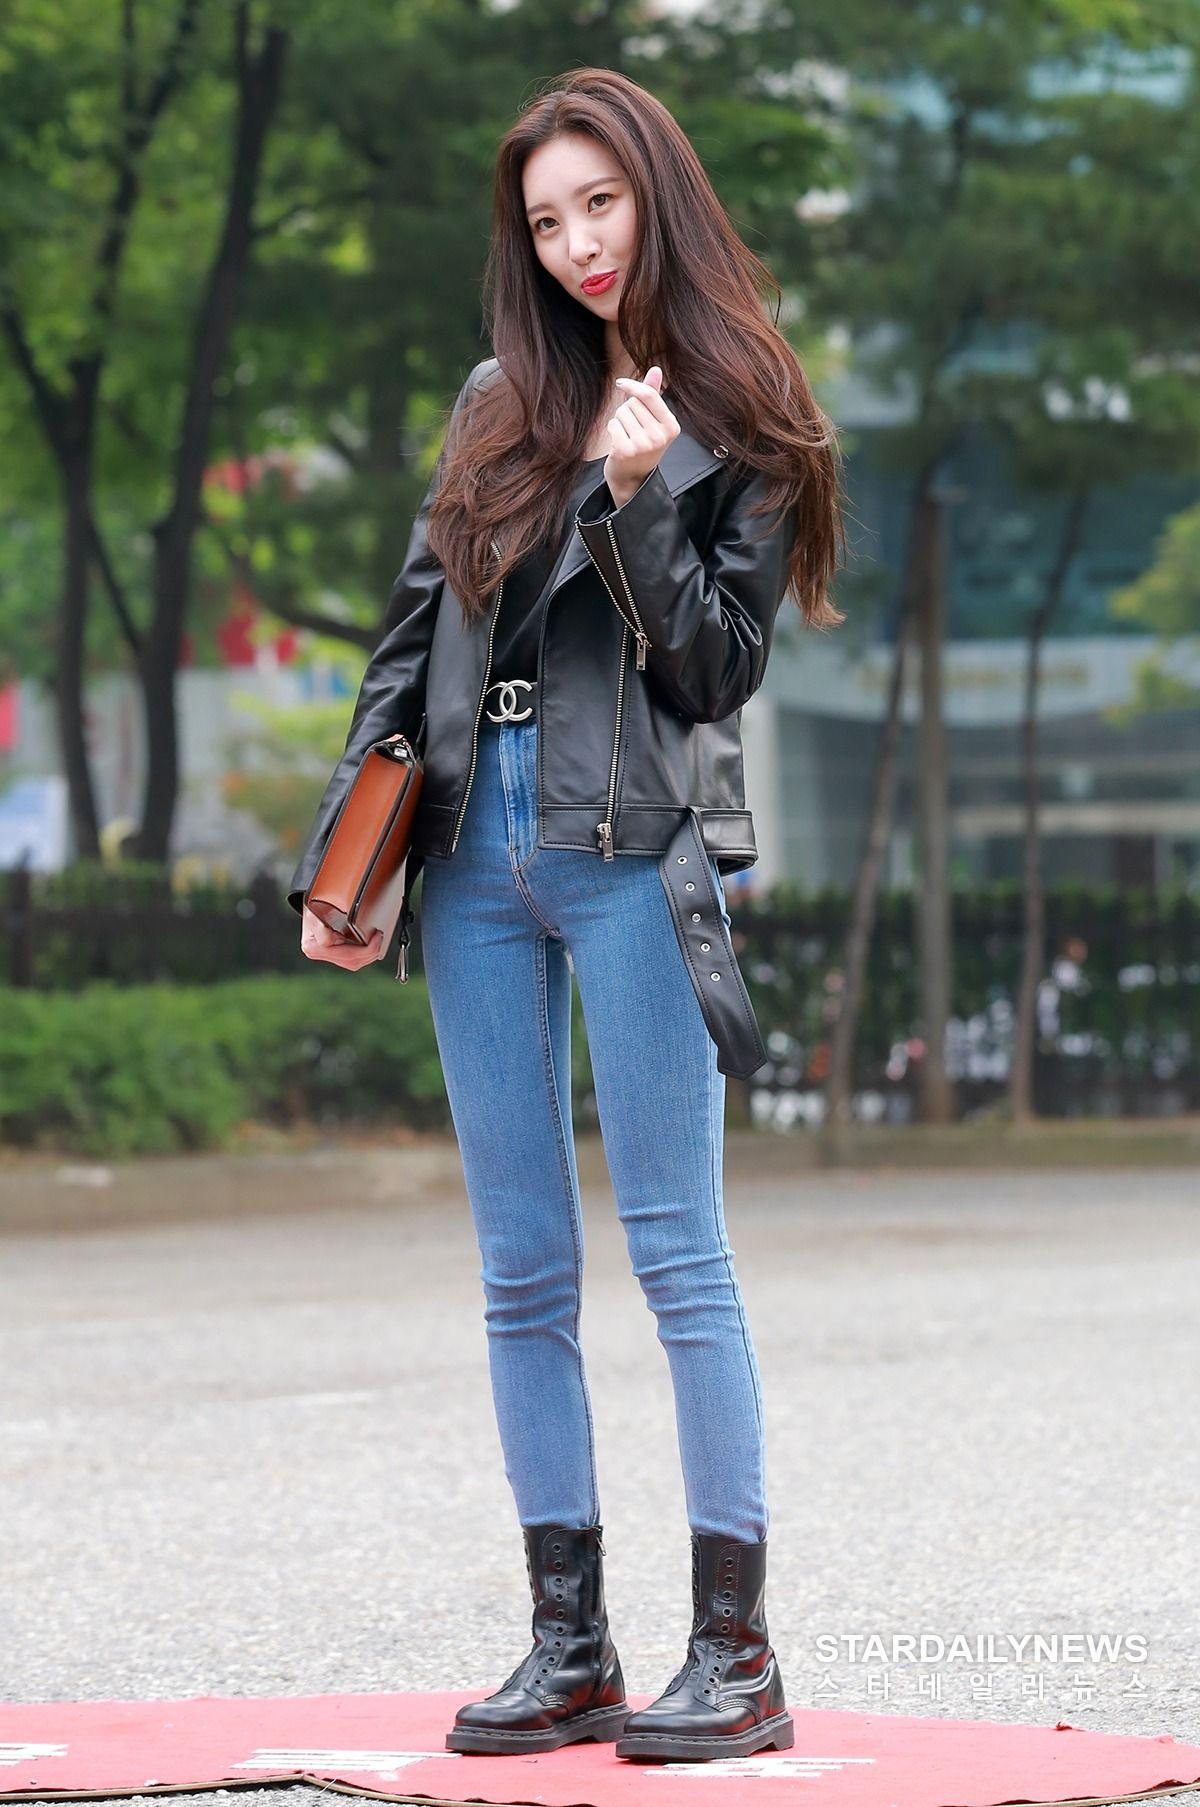 Pin By Ashlynn Lovitt On Sunmi Kpop Fashion Korean Fashion Kpop Outfits